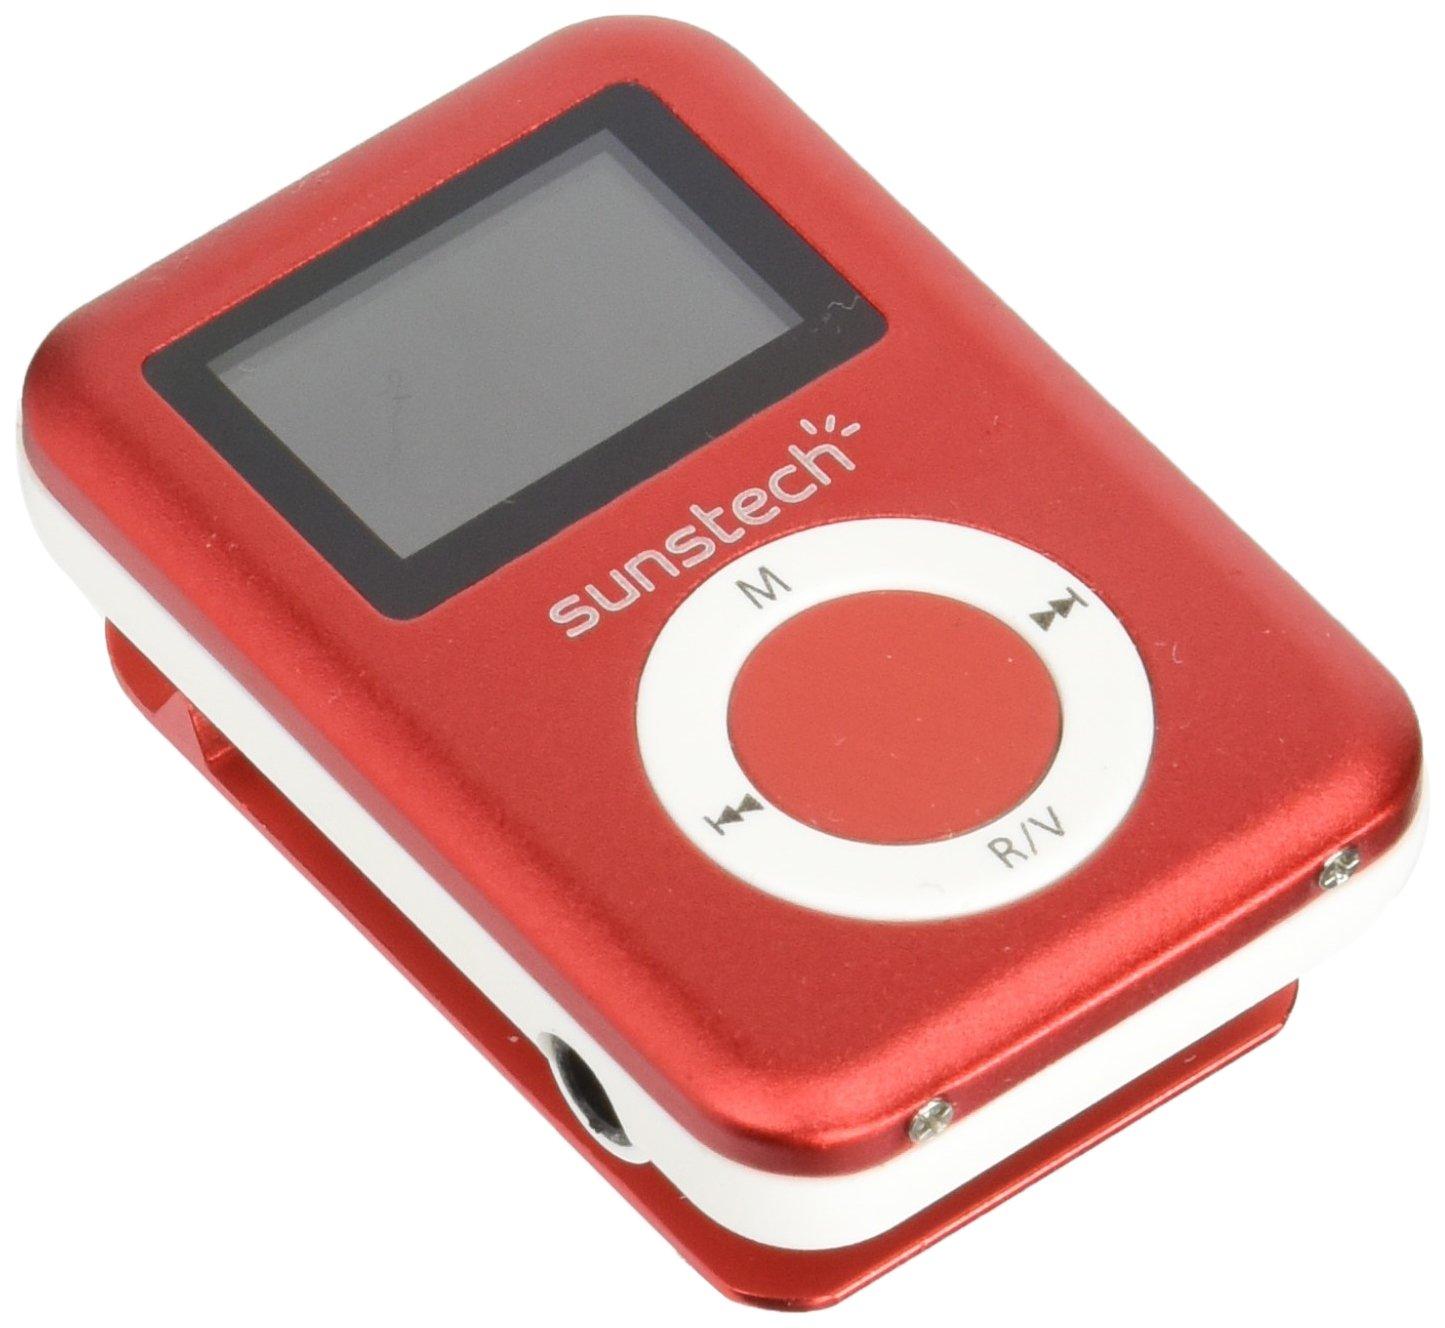 Sunstech DEDALO2BT - Reproductor MP3, Color Rojo